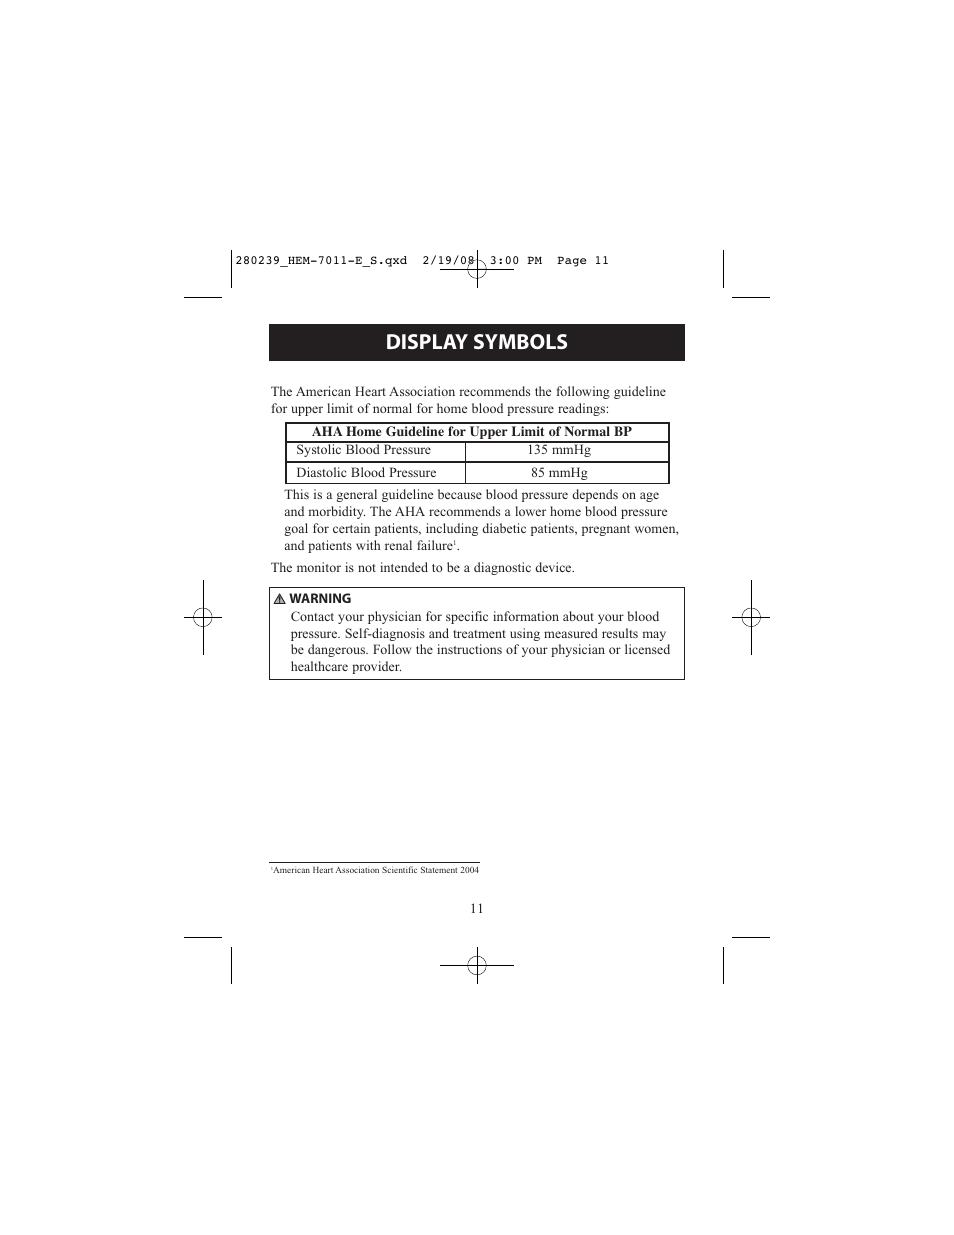 Display Symbols Omron Healthcare Intelli Sense Hem 711ac User